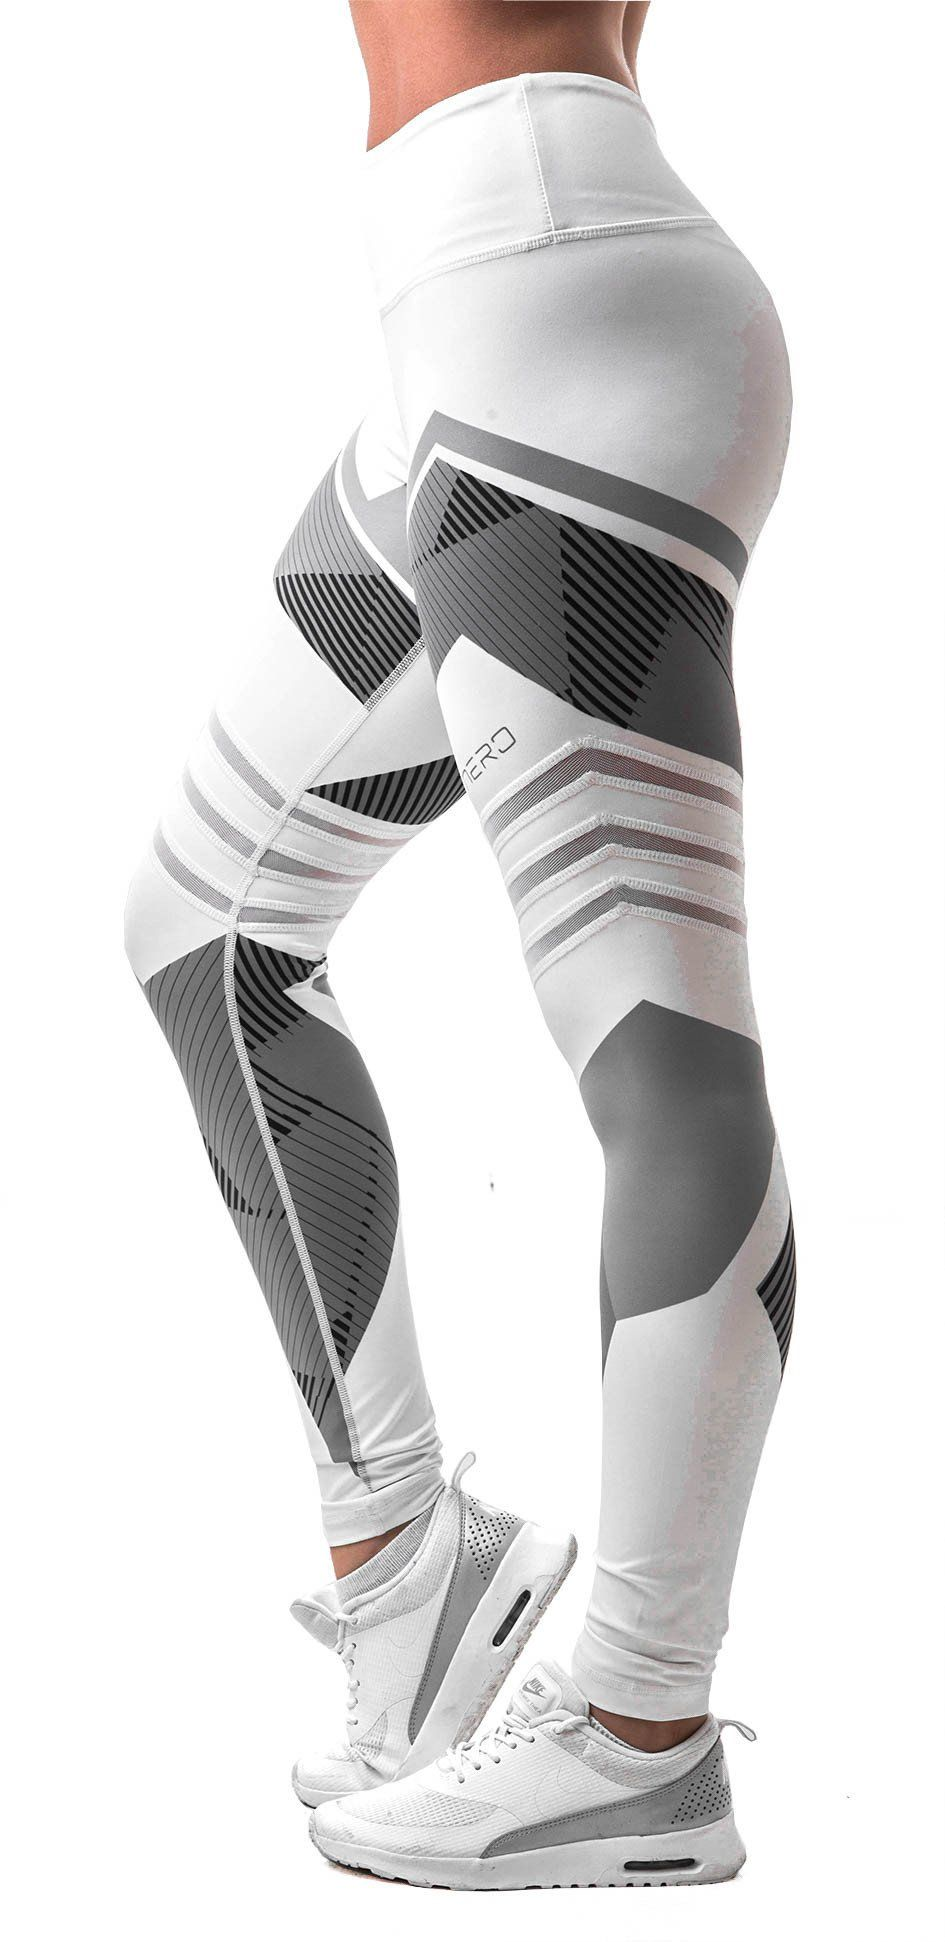 Boho Geometric Leggings Plus Size Gym Tights Activewear Printed Leggings